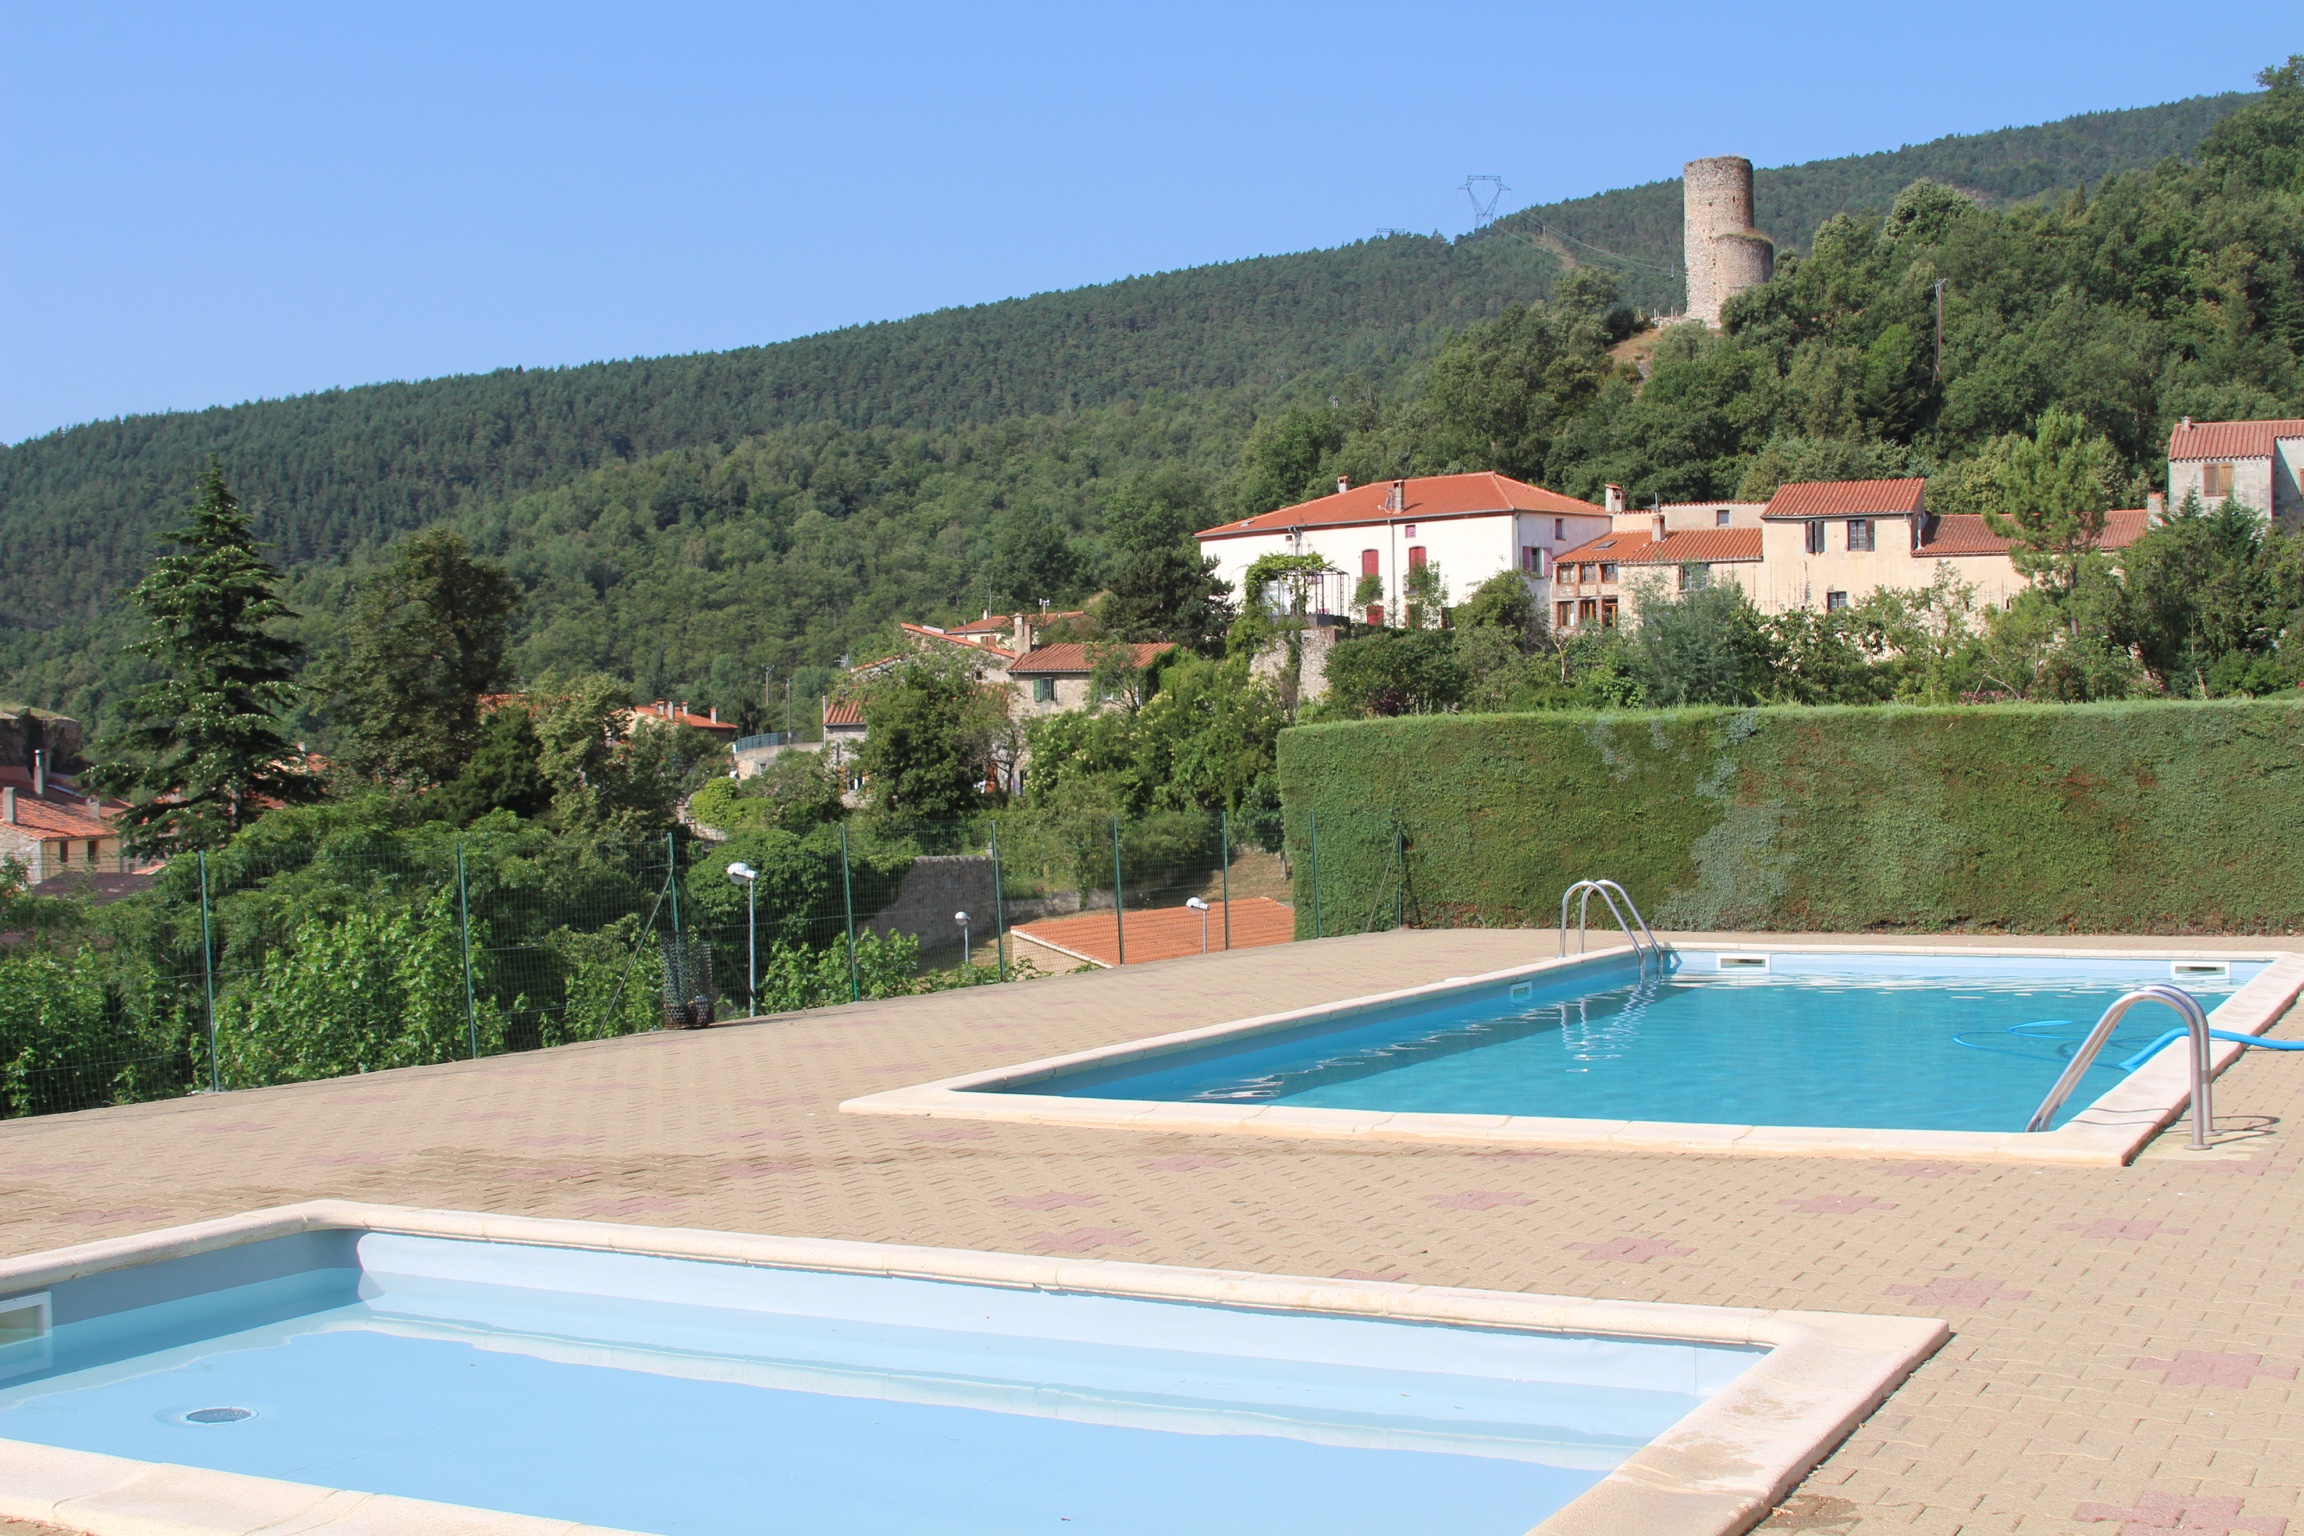 Local swimming pool @ Corsavy